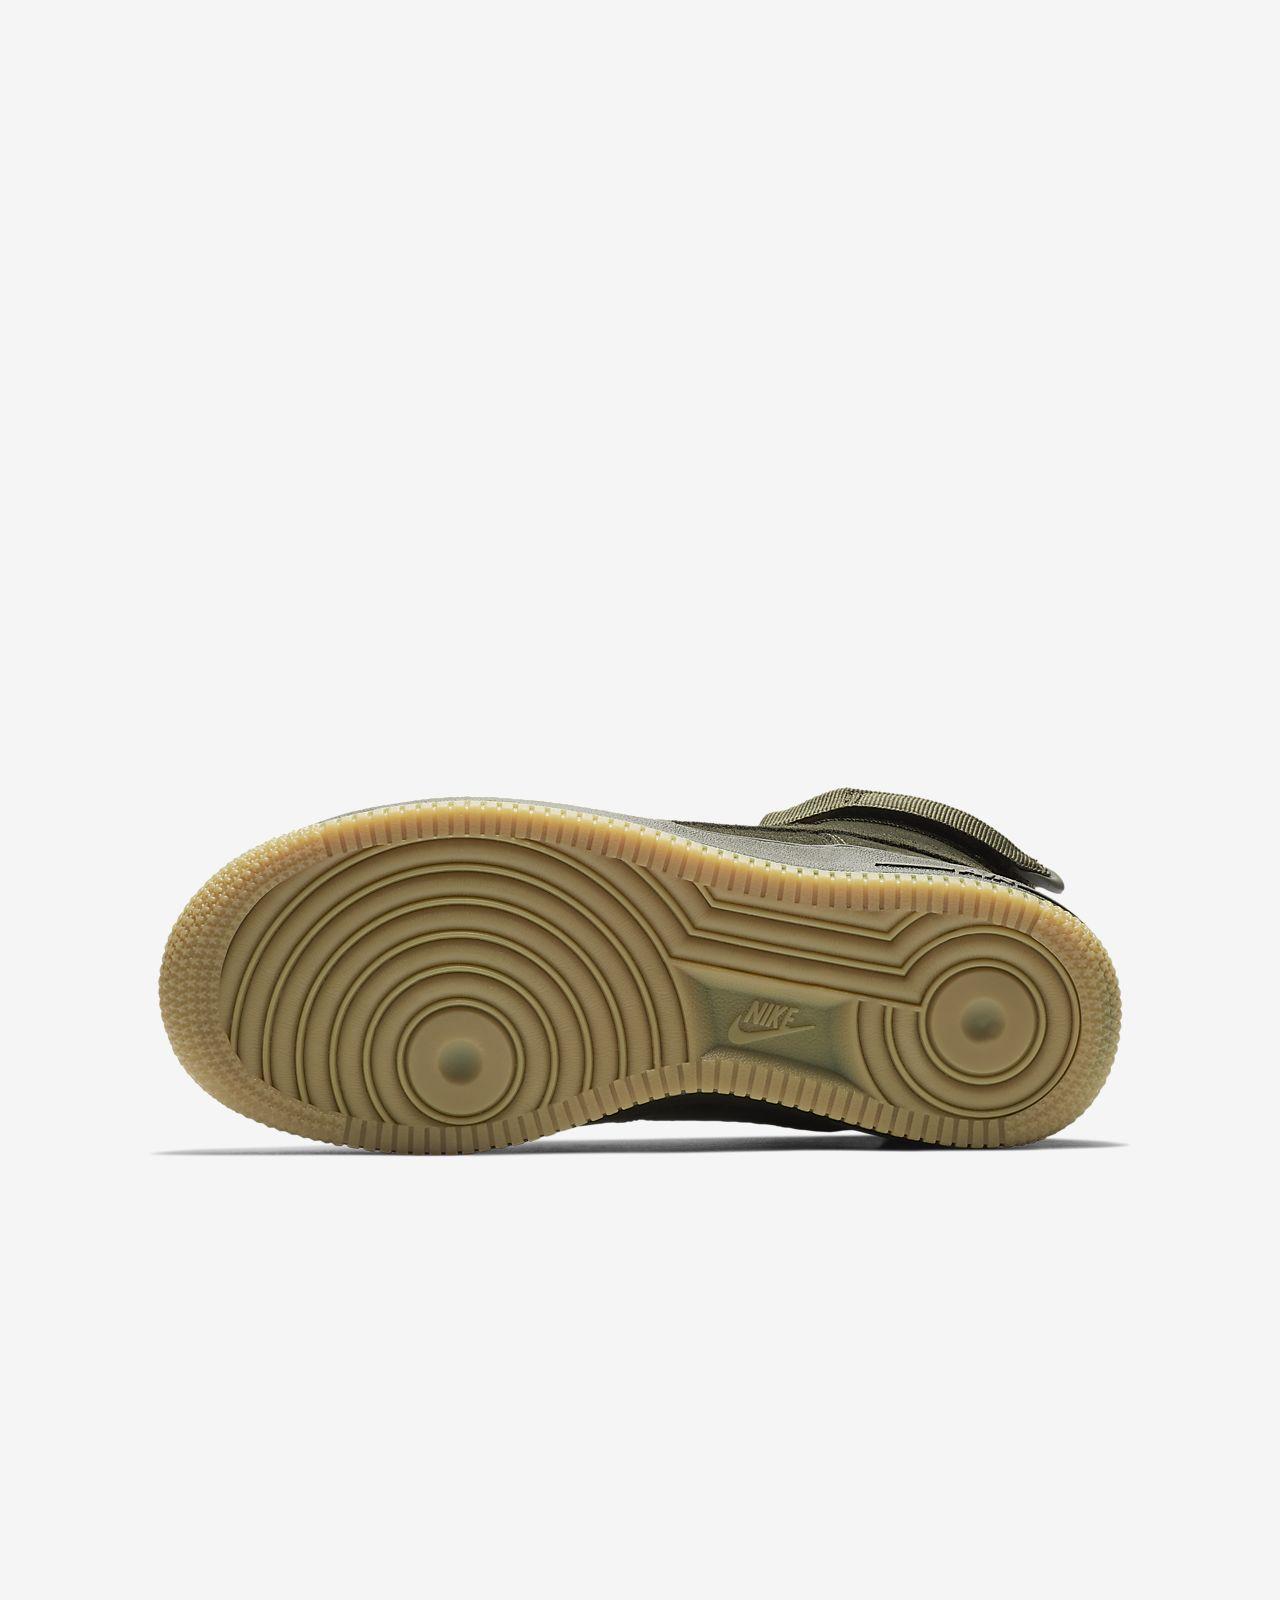 3c763ea4e21 Nike Air Force 1 High LV8 Older Kids' Shoe. Nike.com GB